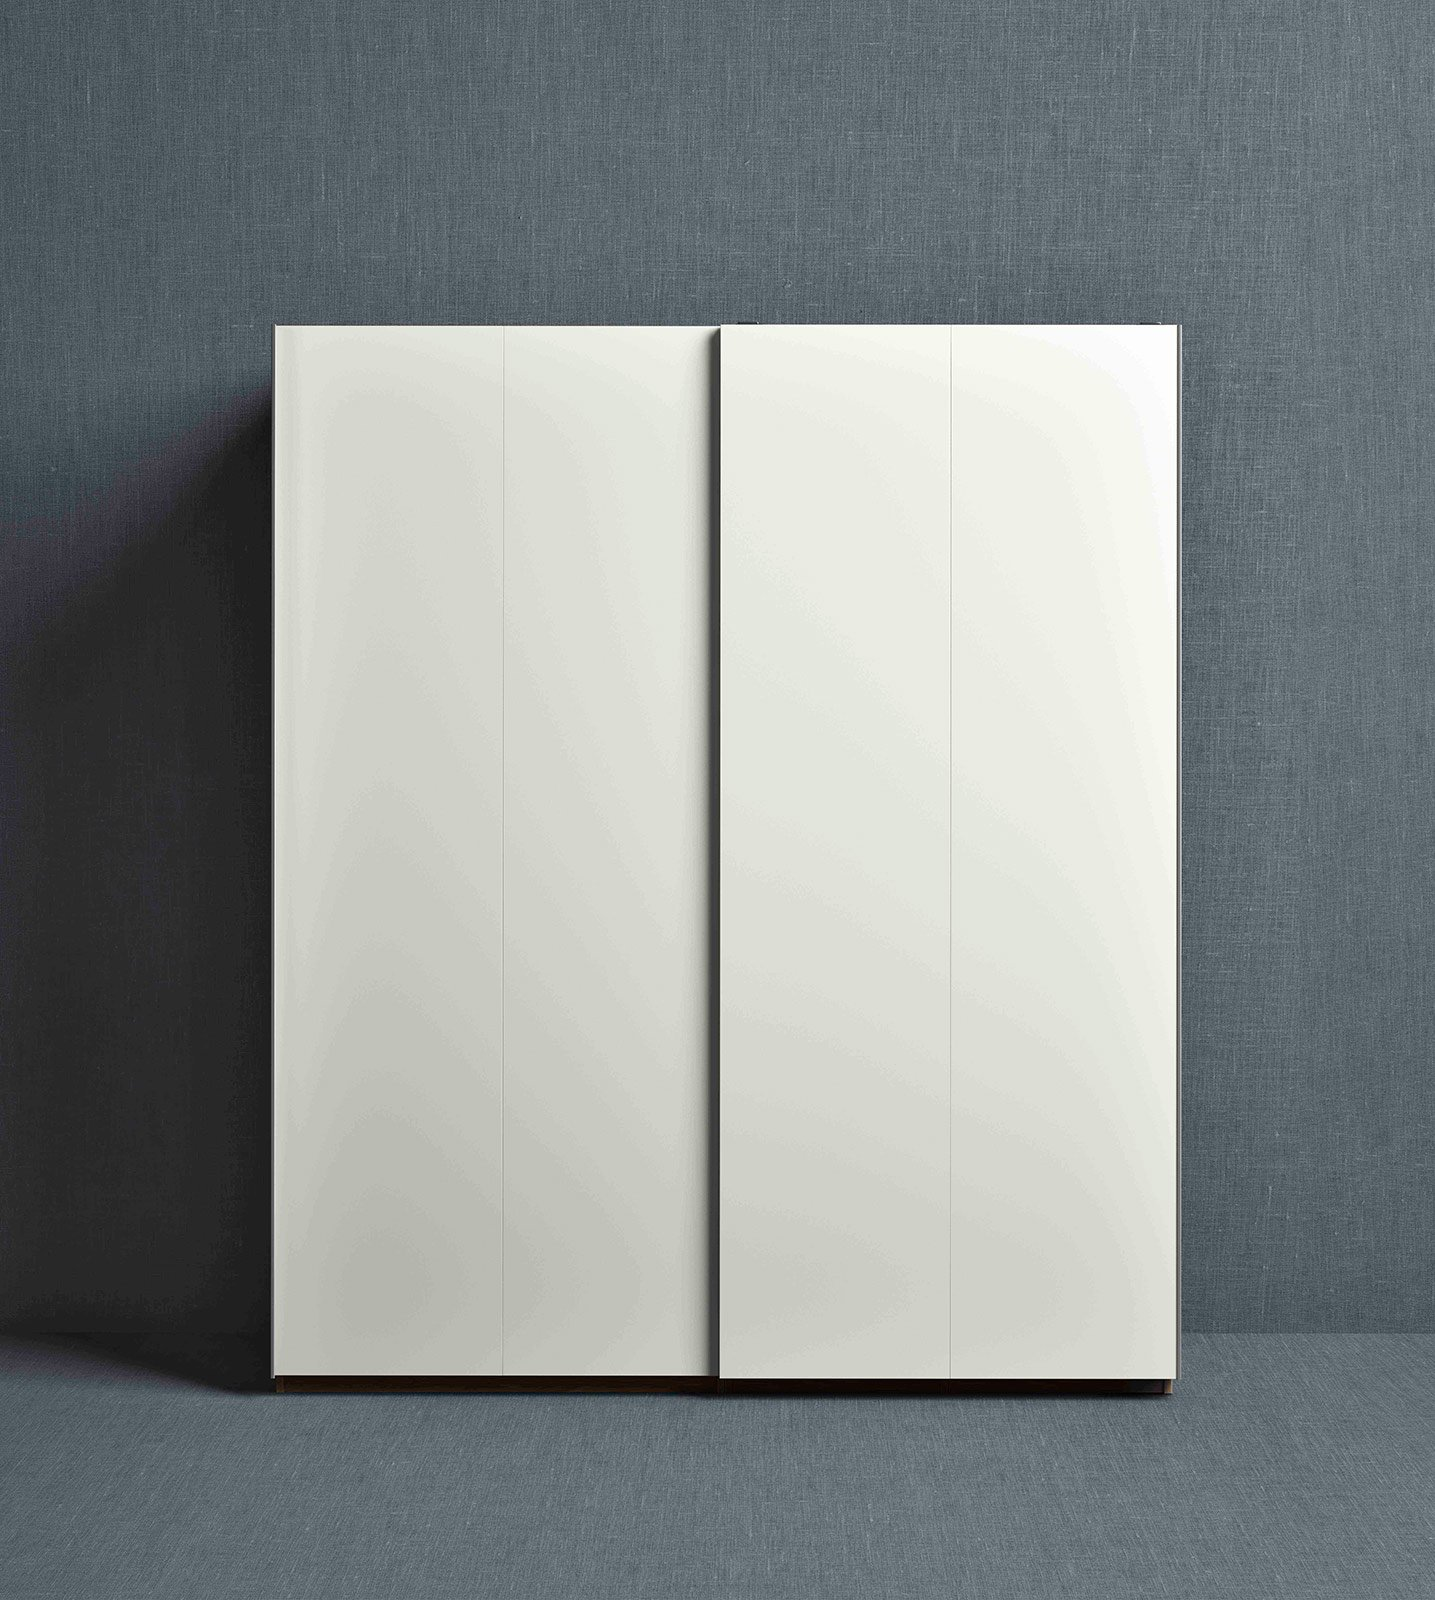 Armadi total white cose di casa for Ikea armadi scorrevoli